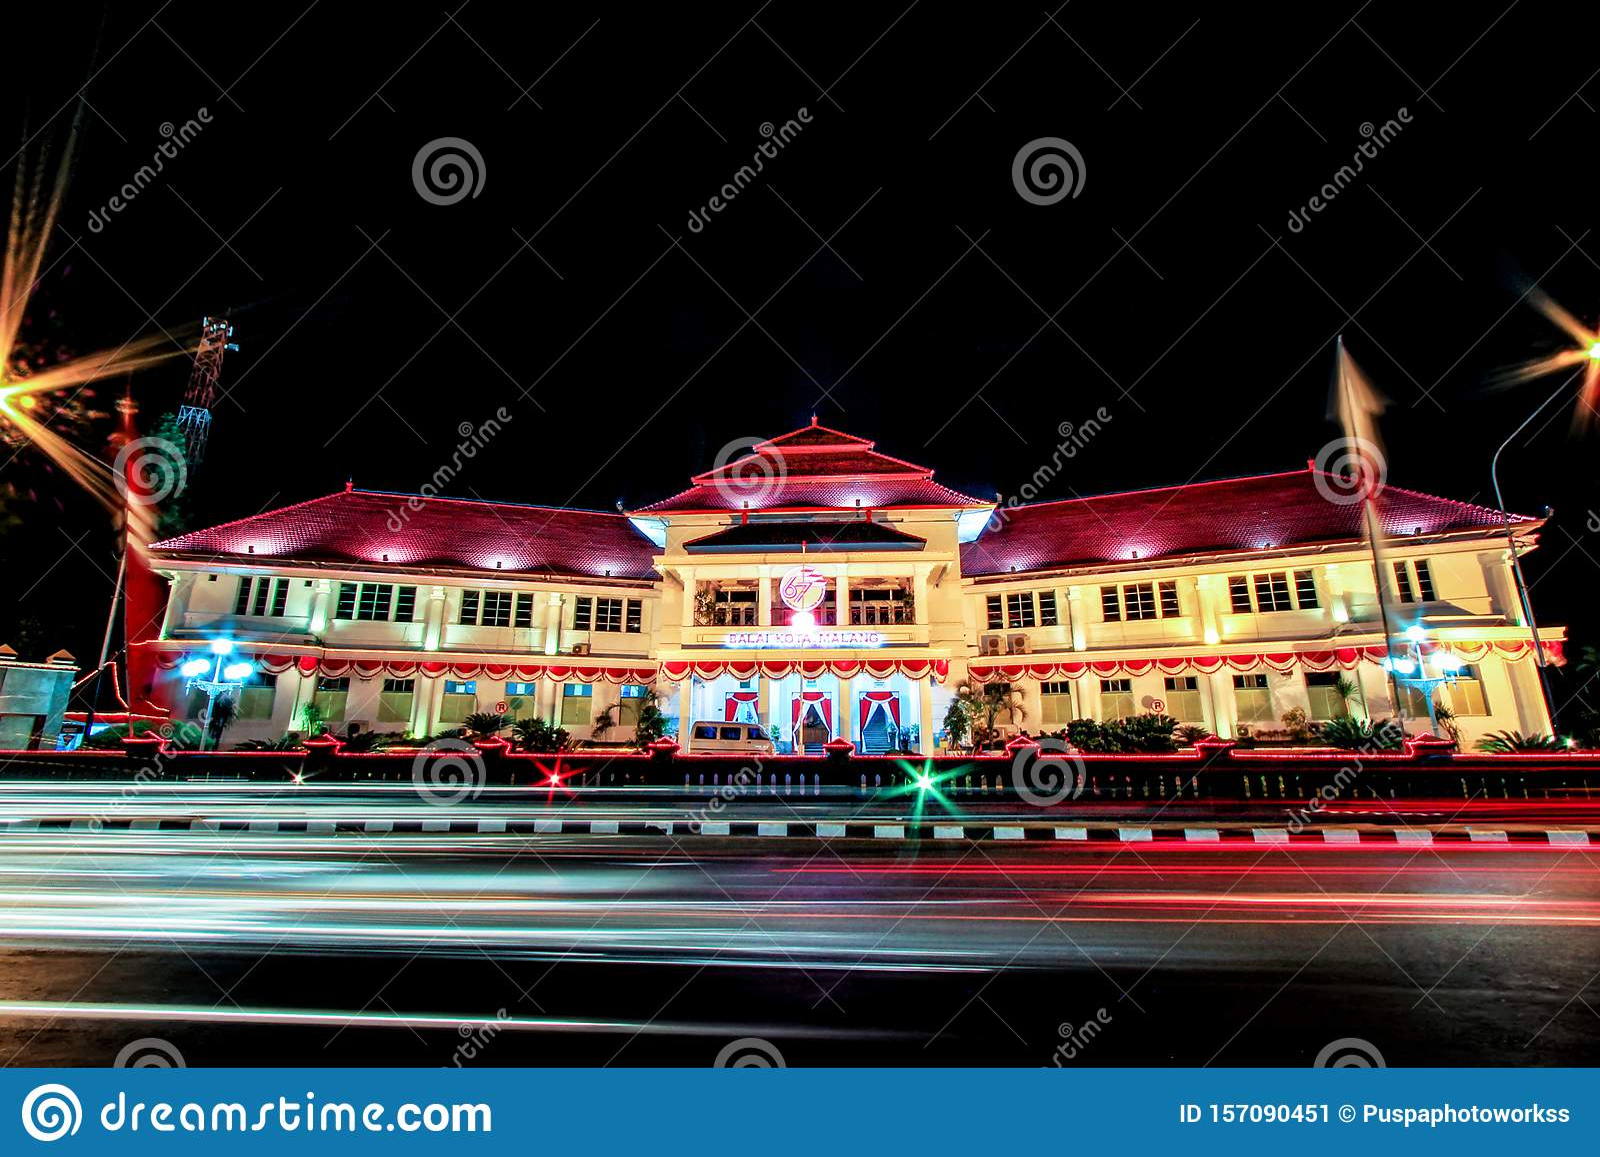 Beautiful Balai Kota Malang City Hall Malang Tugu Square Or Km 0 Malang With Beautiful Park At The Night Stock Image Image Of Construction Centuries 157090451